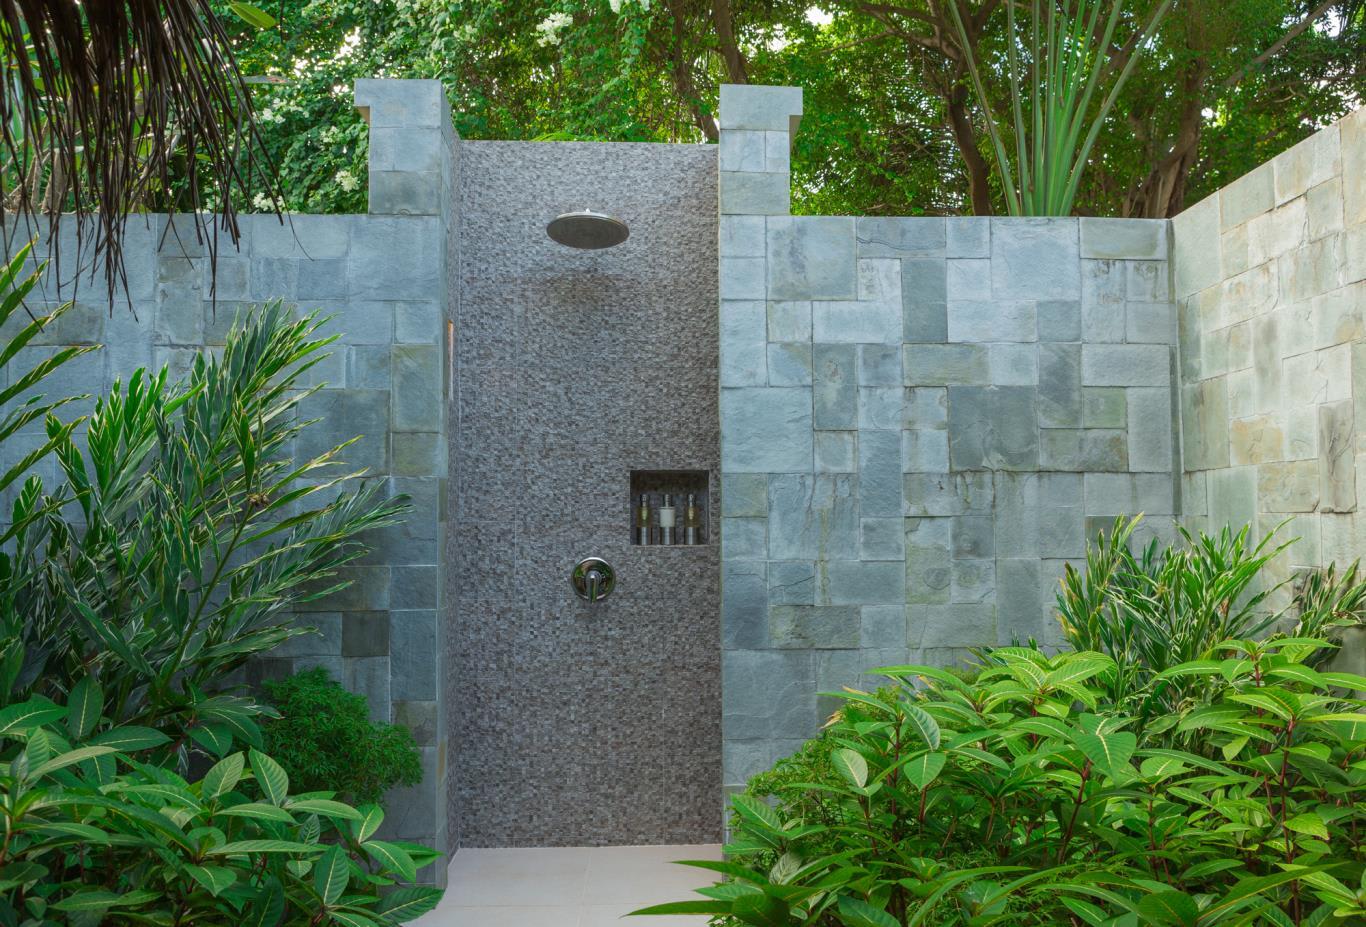 Baros Villa Outdoor Shower